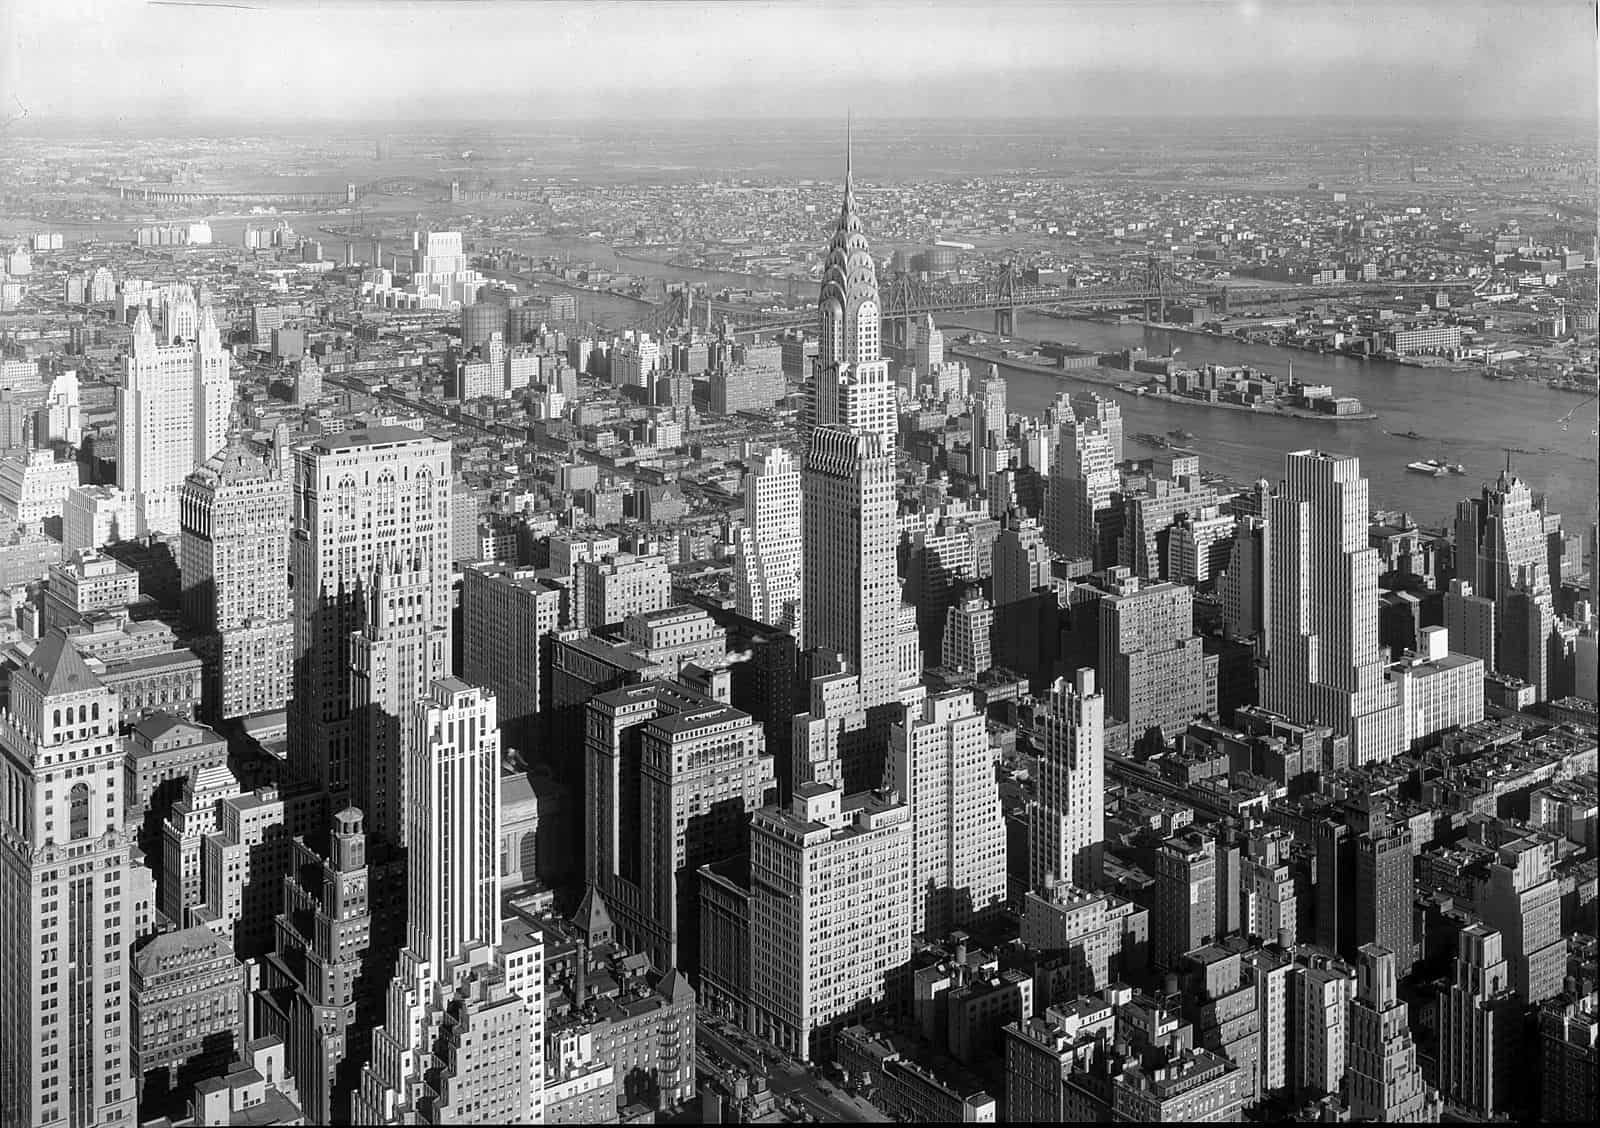 Chrysler_Building_Midtown_Manhattan_New_York_City_1932